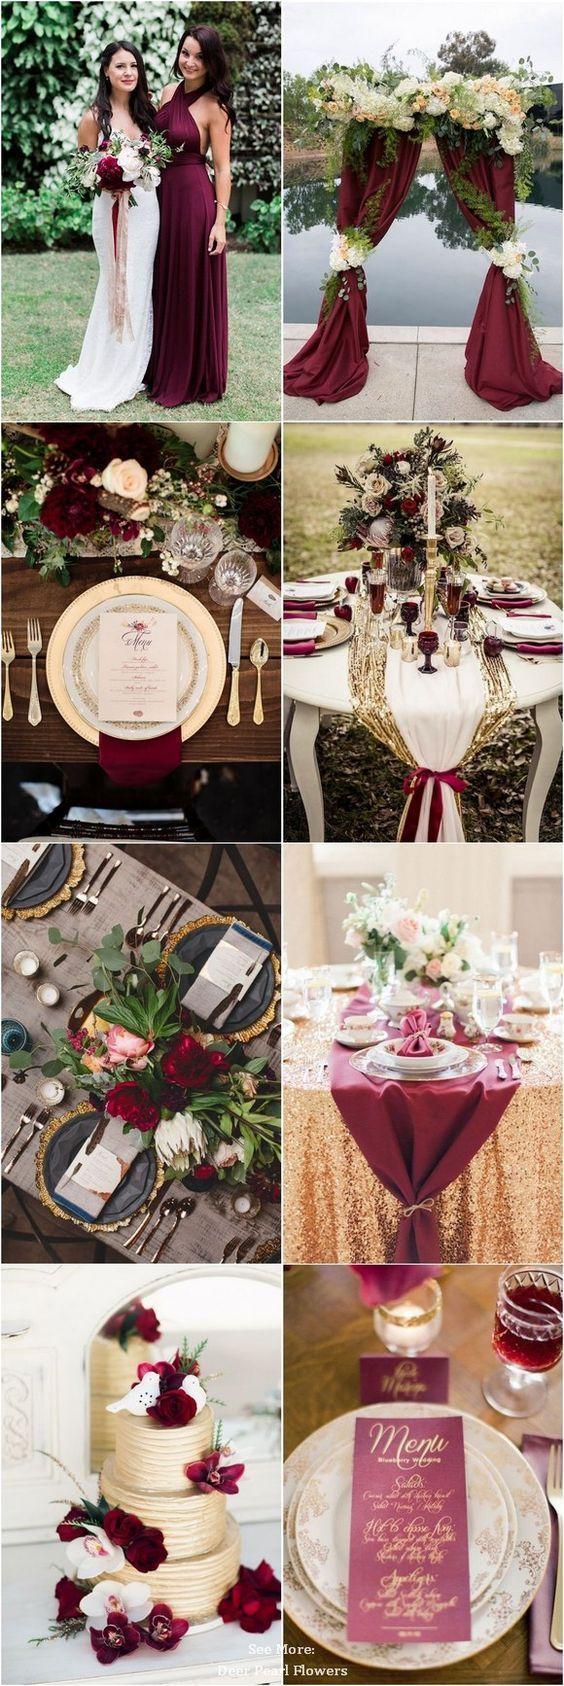 30 Elegant Autumn Burgundy and Gold Wedding Ideas - Wedding Theme - #Burgundy ...